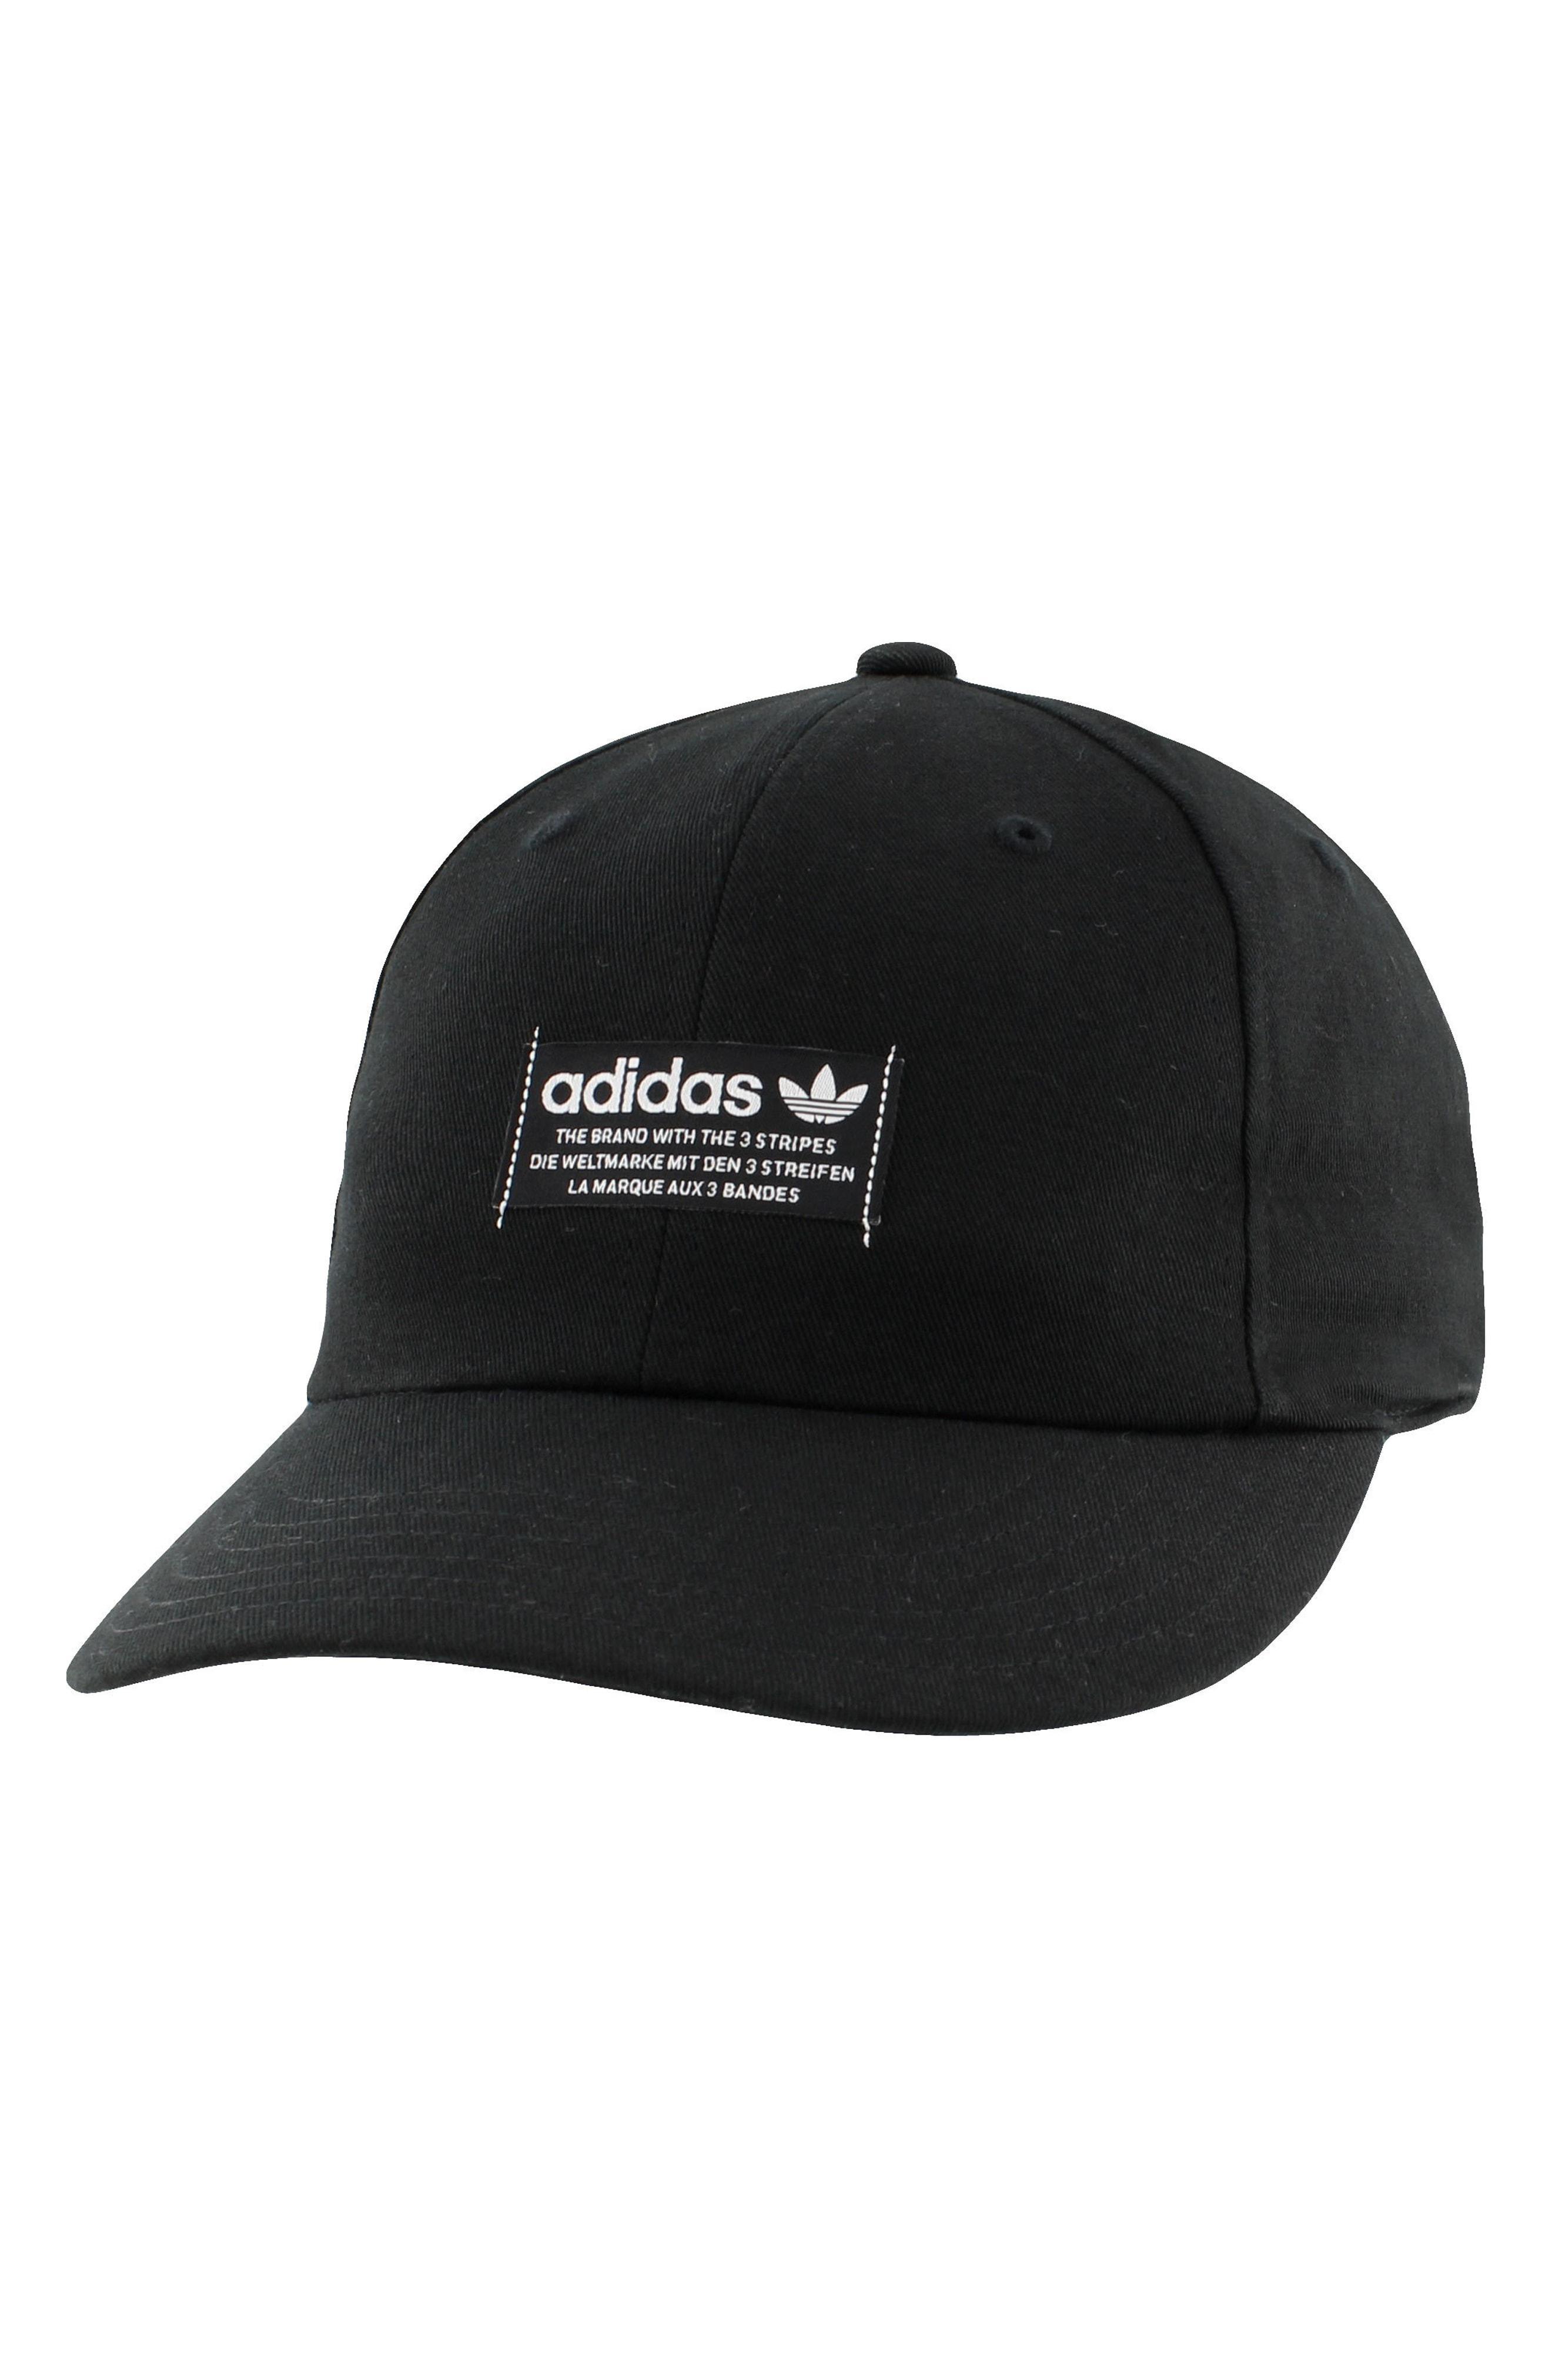 Lyst - adidas Originals Adidas Original Relaxed Patch Ball Cap in ... 6e35fd6522